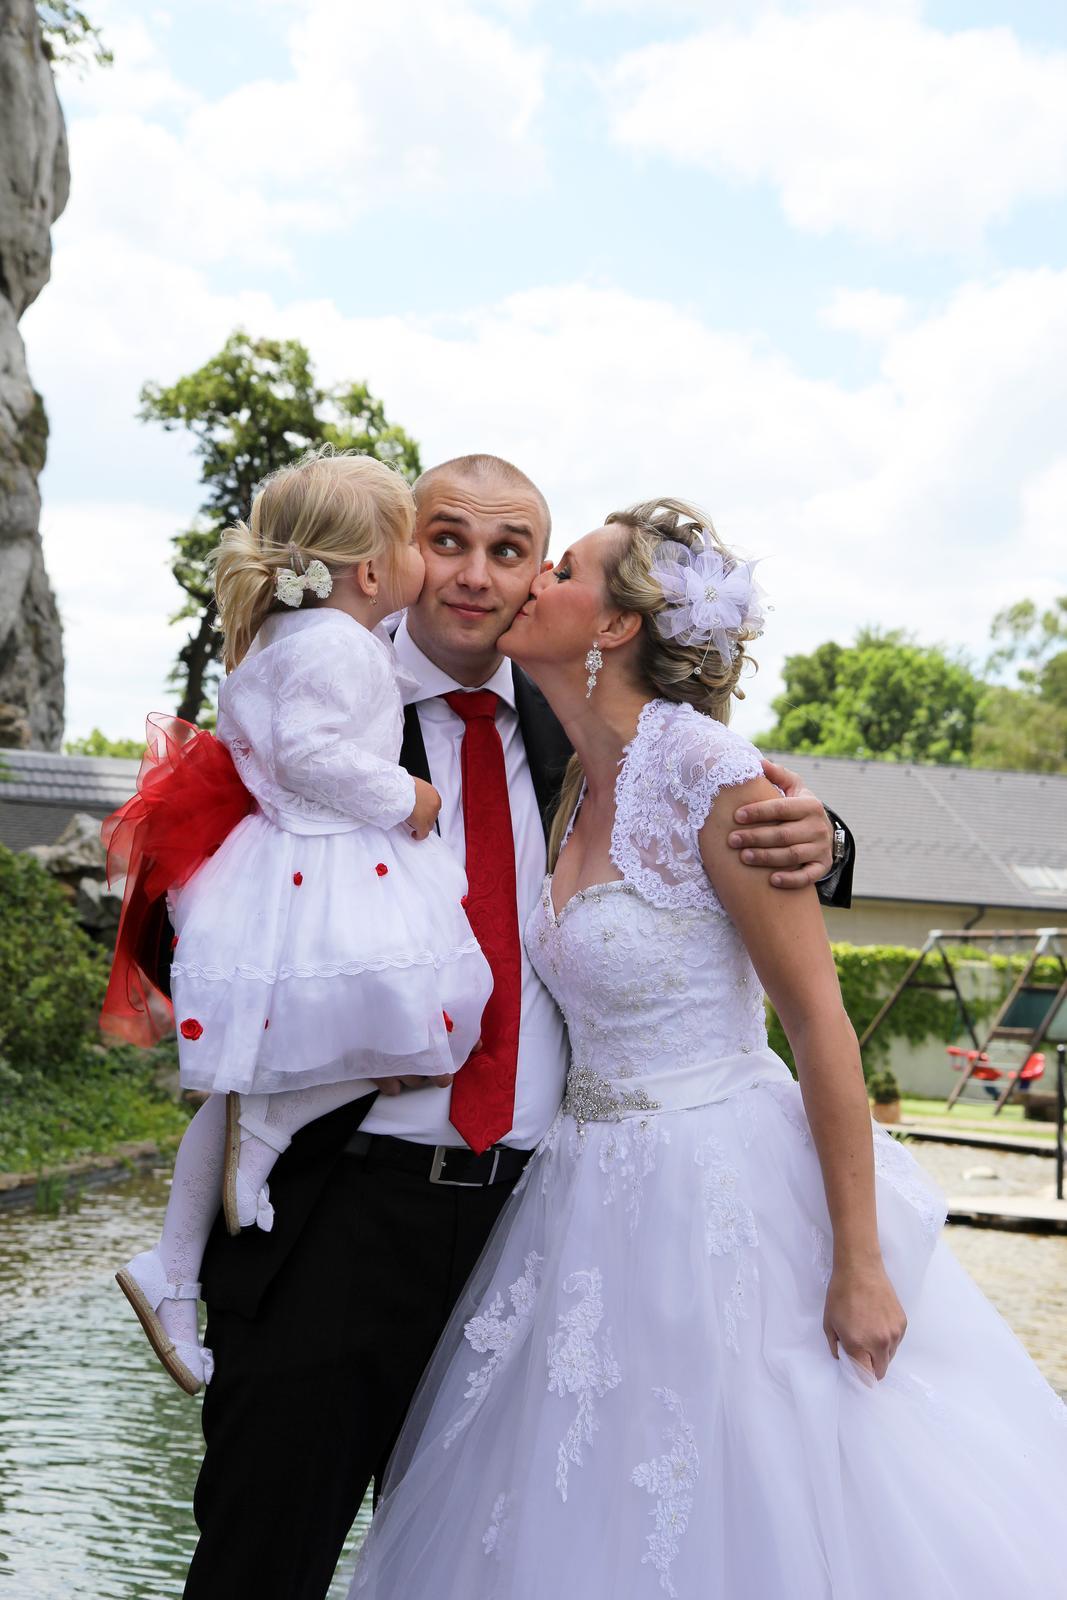 Lenka{{_AND_}}Tomáš - Tatino a jeho dve baby...